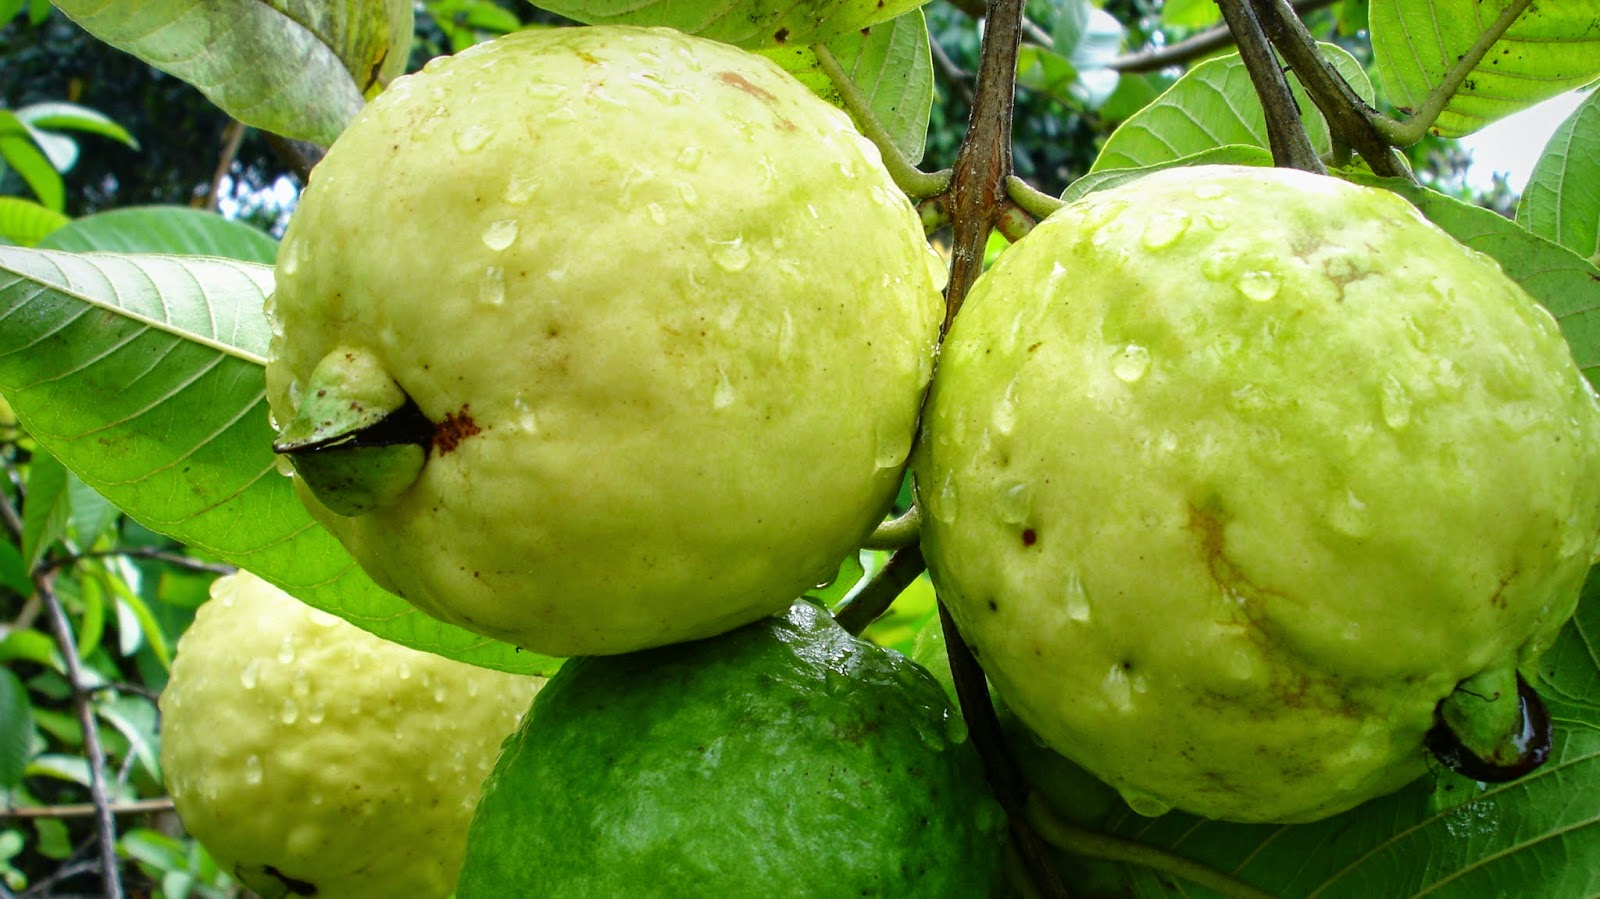 111120121027-jambu-biji-guava.jpg